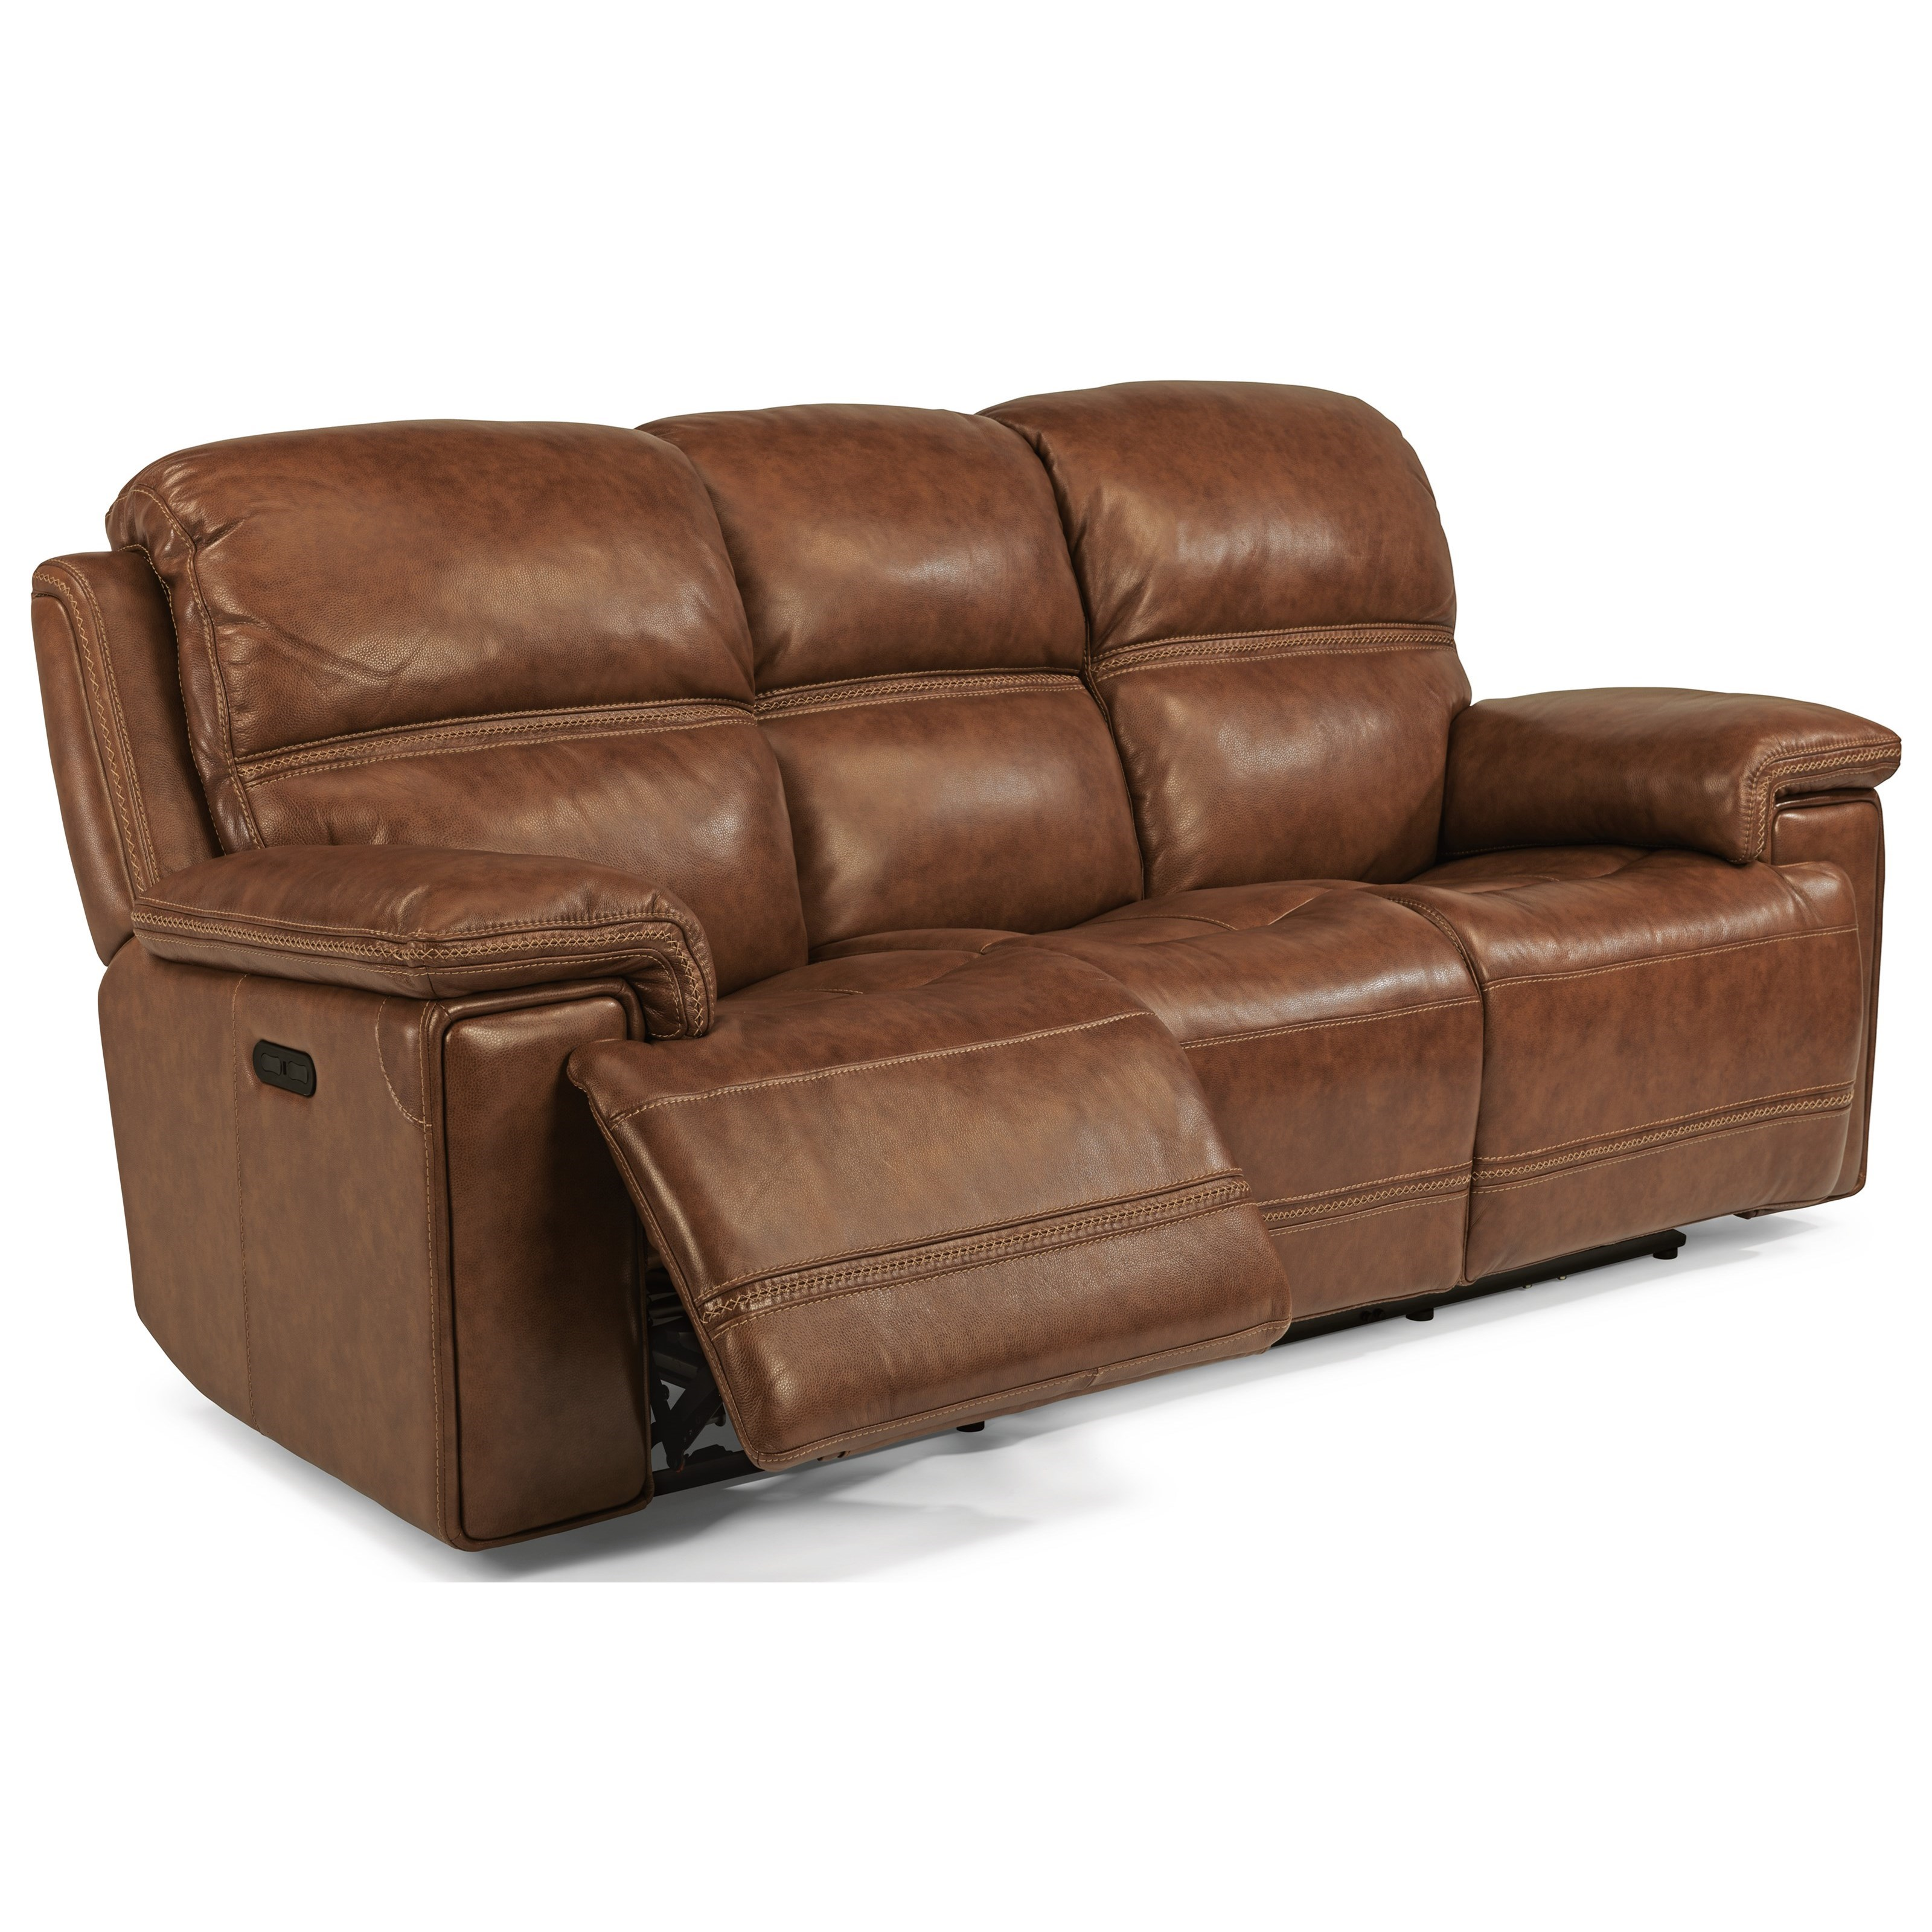 Latitudes-Fenwick Pwr Reclining Leather Sofa w/ Pwr Headrest by Flexsteel at Walker's Furniture